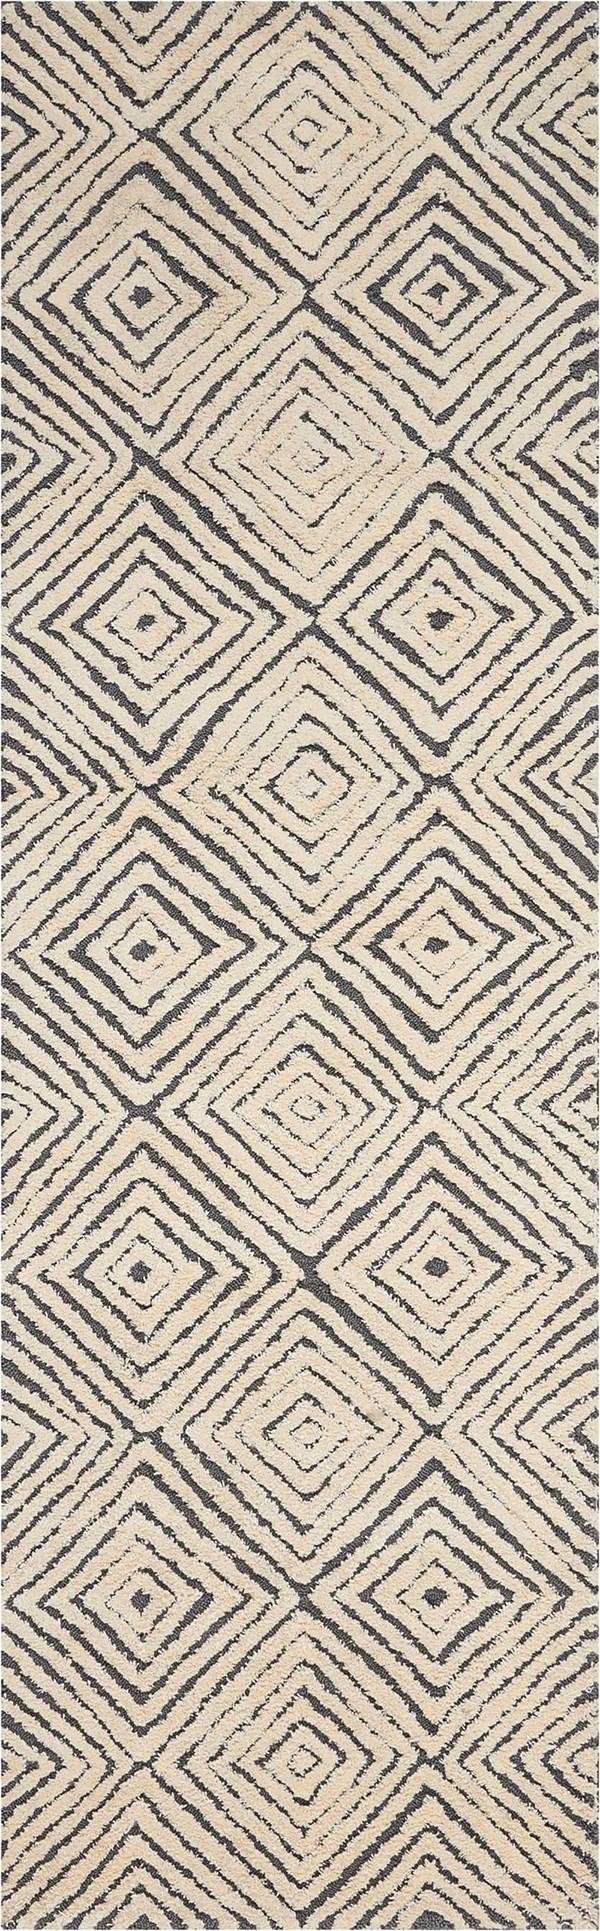 Grey, Ivory Geometric Area Rug